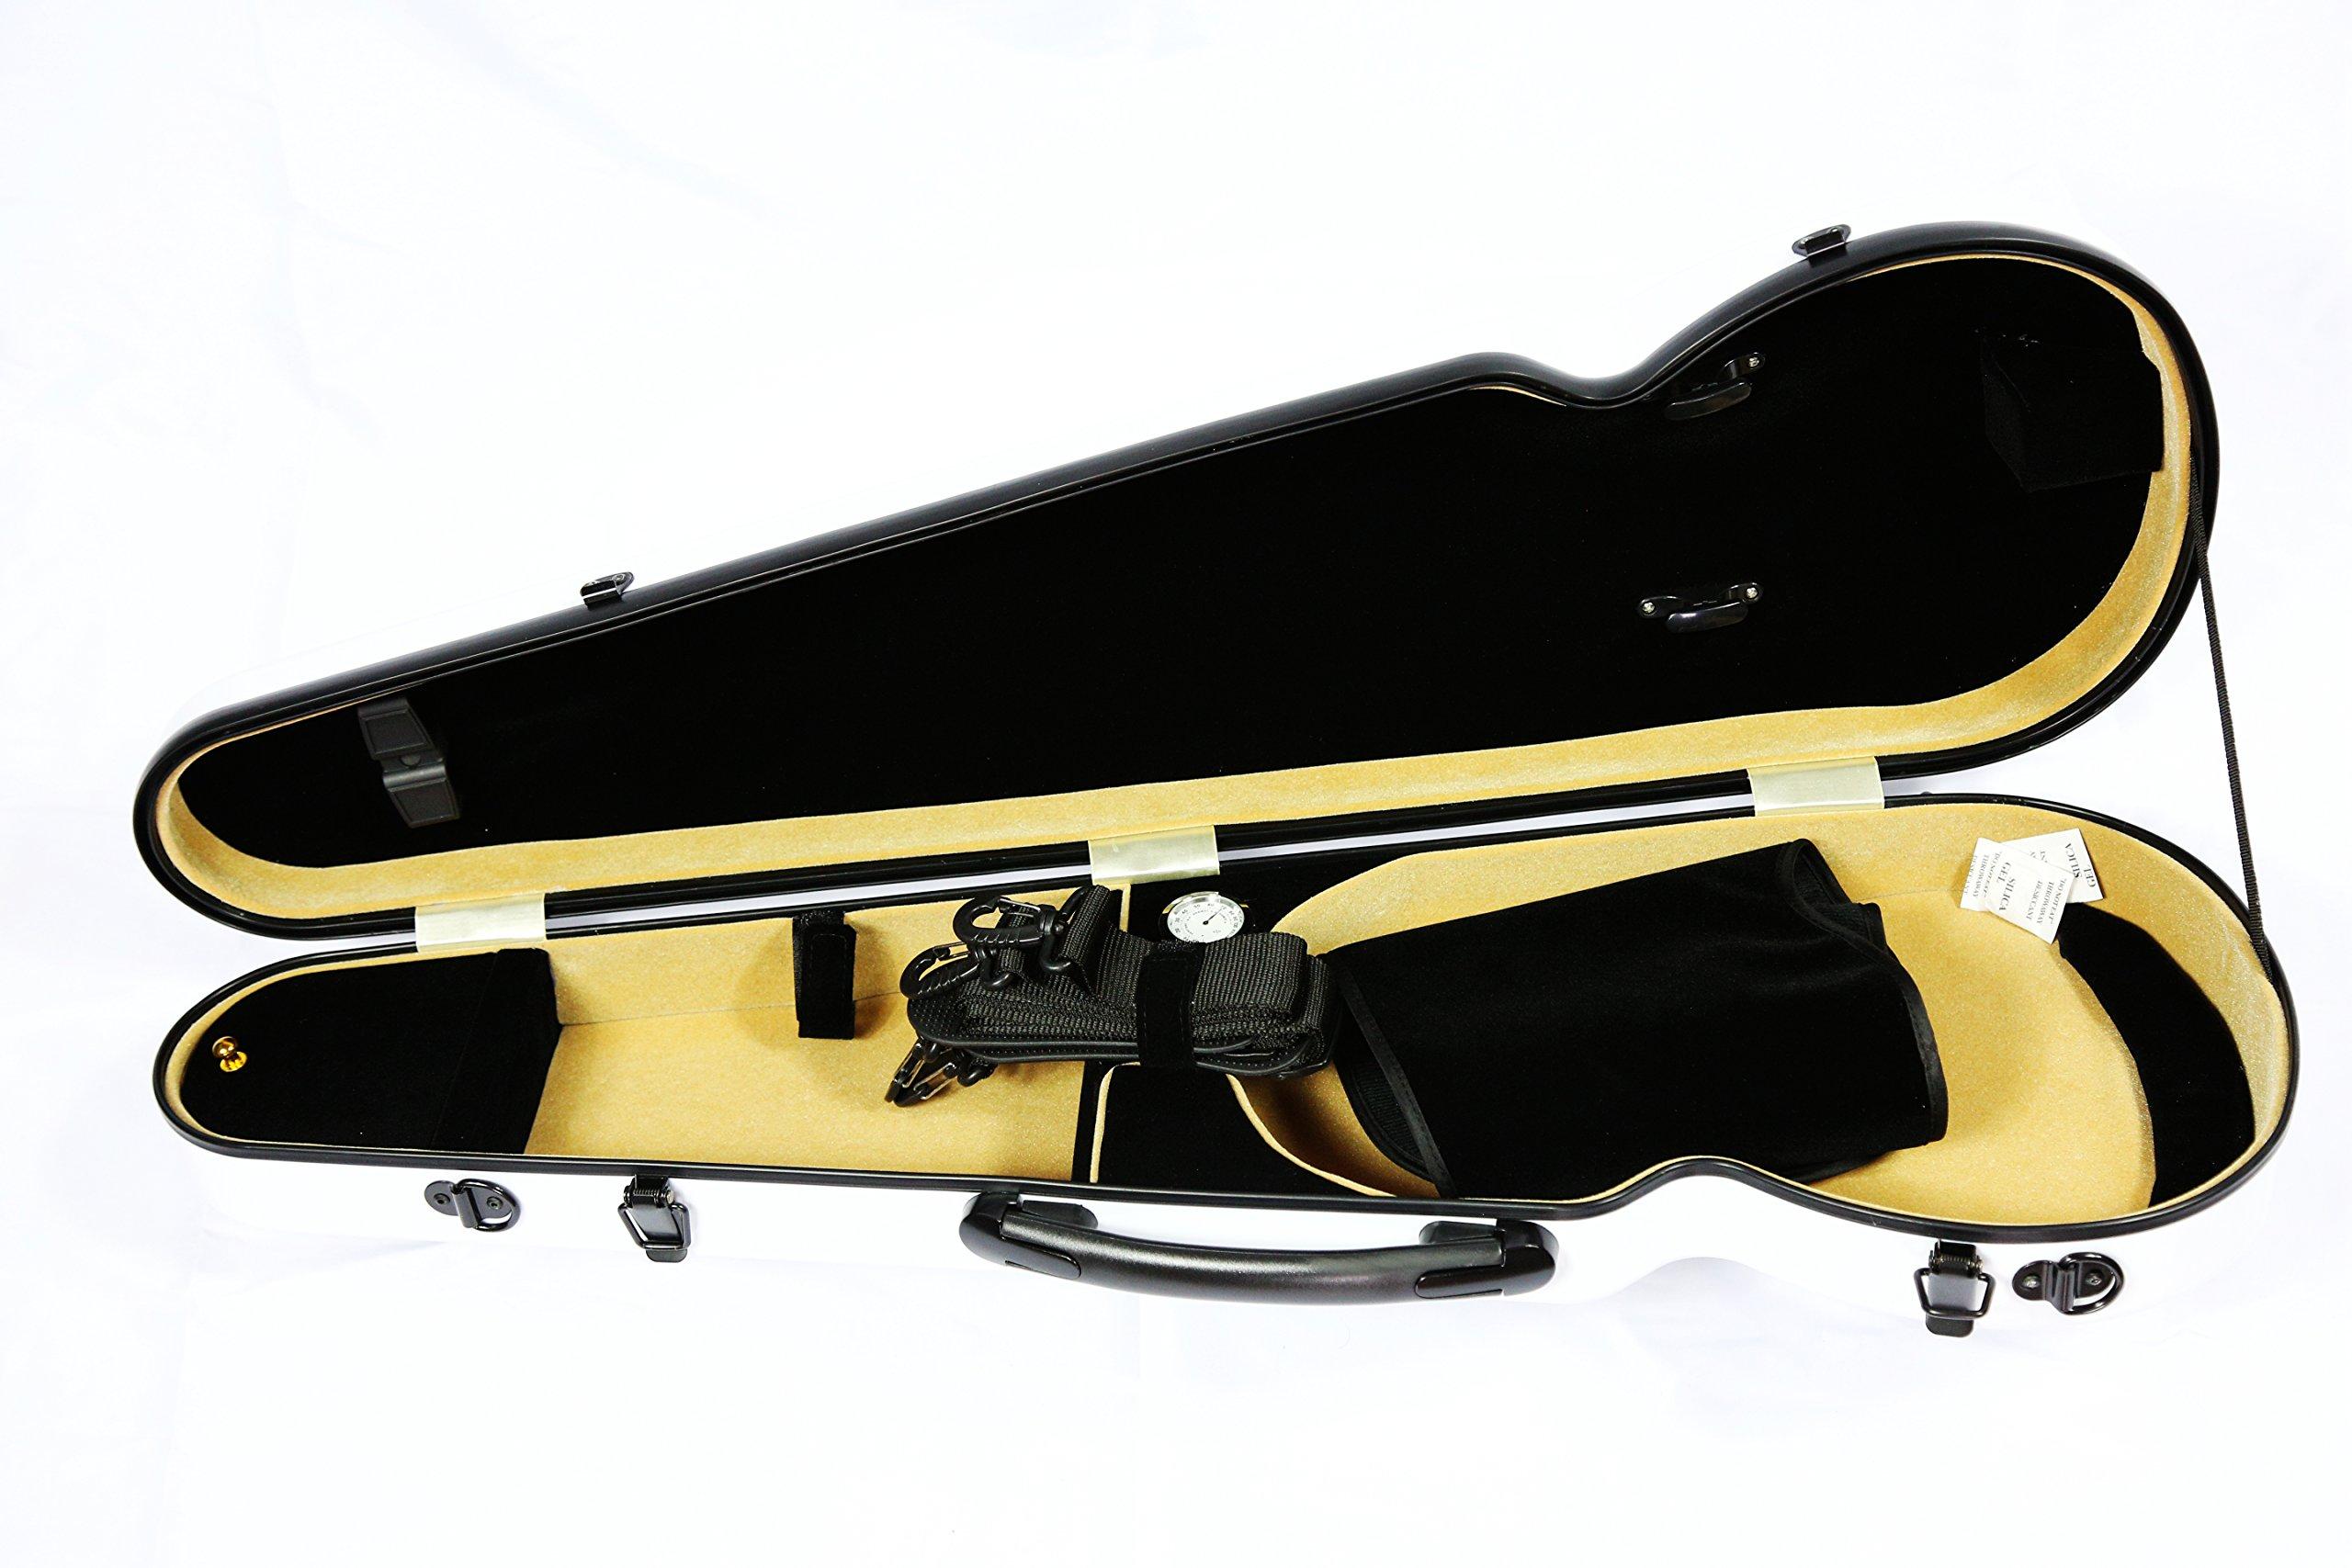 Vio Music Full Size Hightech Carbon-Like Combo Violin Case 4/4-White, New Design